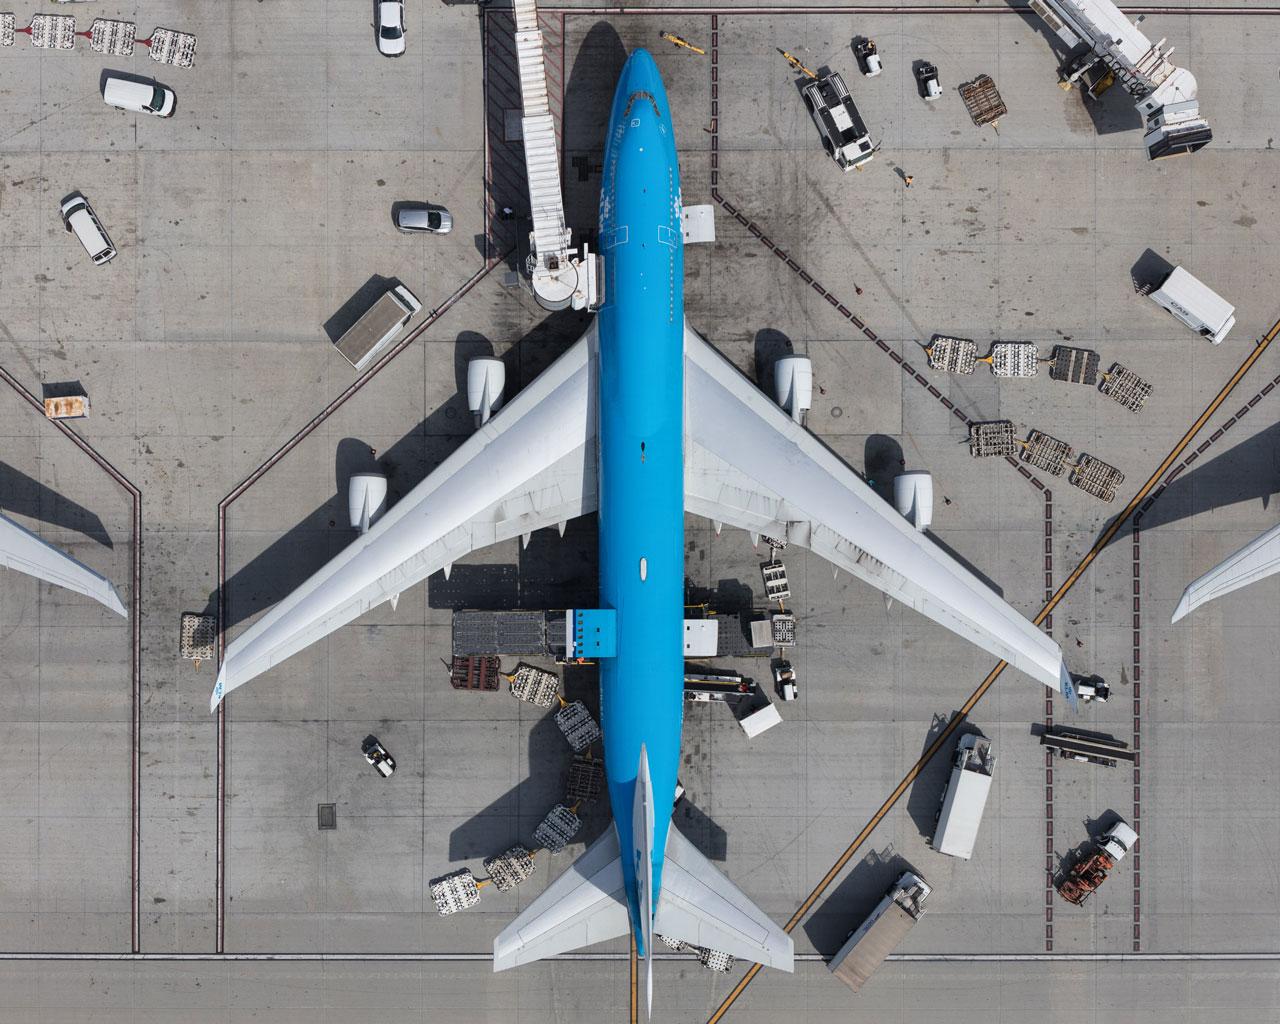 Airplane Mode - NBC News